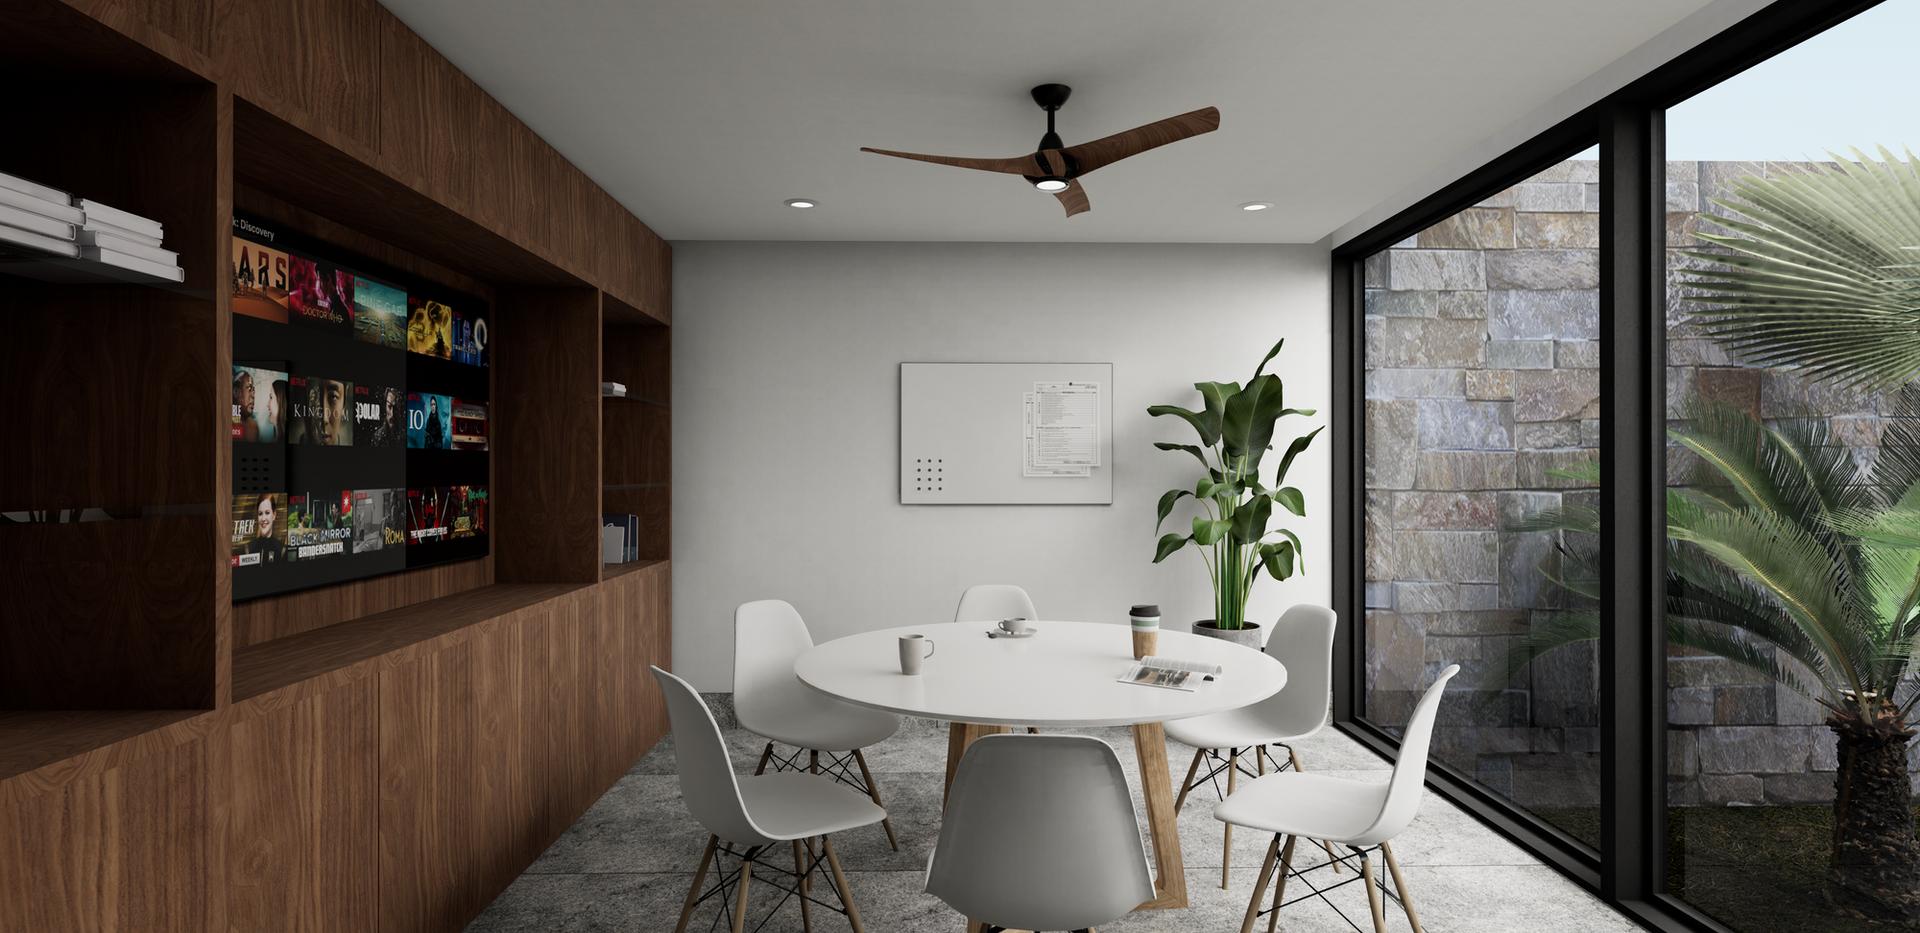 UR-DM Arquitectos Oficinas-Render 7.png